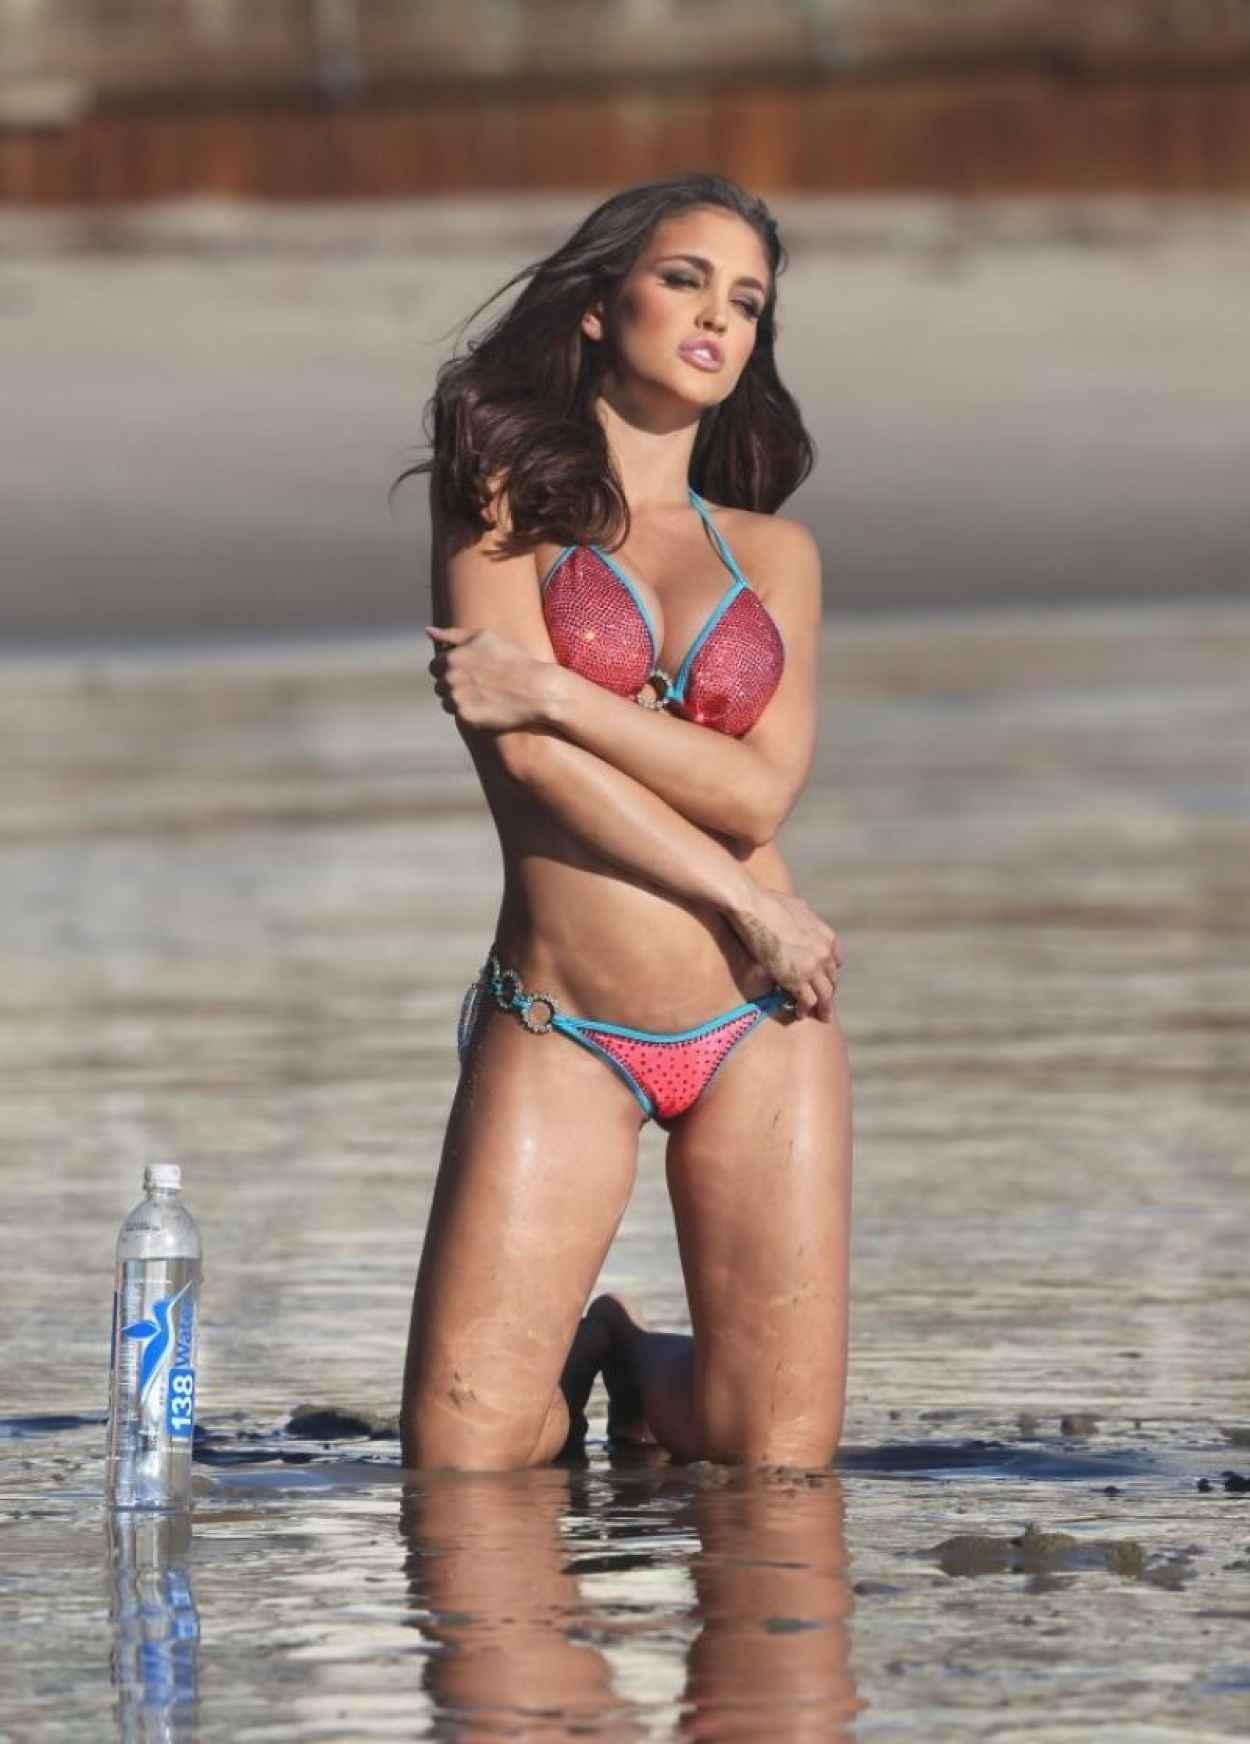 Jaclyn Swedberg in a Bikini - Photoshoot for 138 Water in Malibu-1